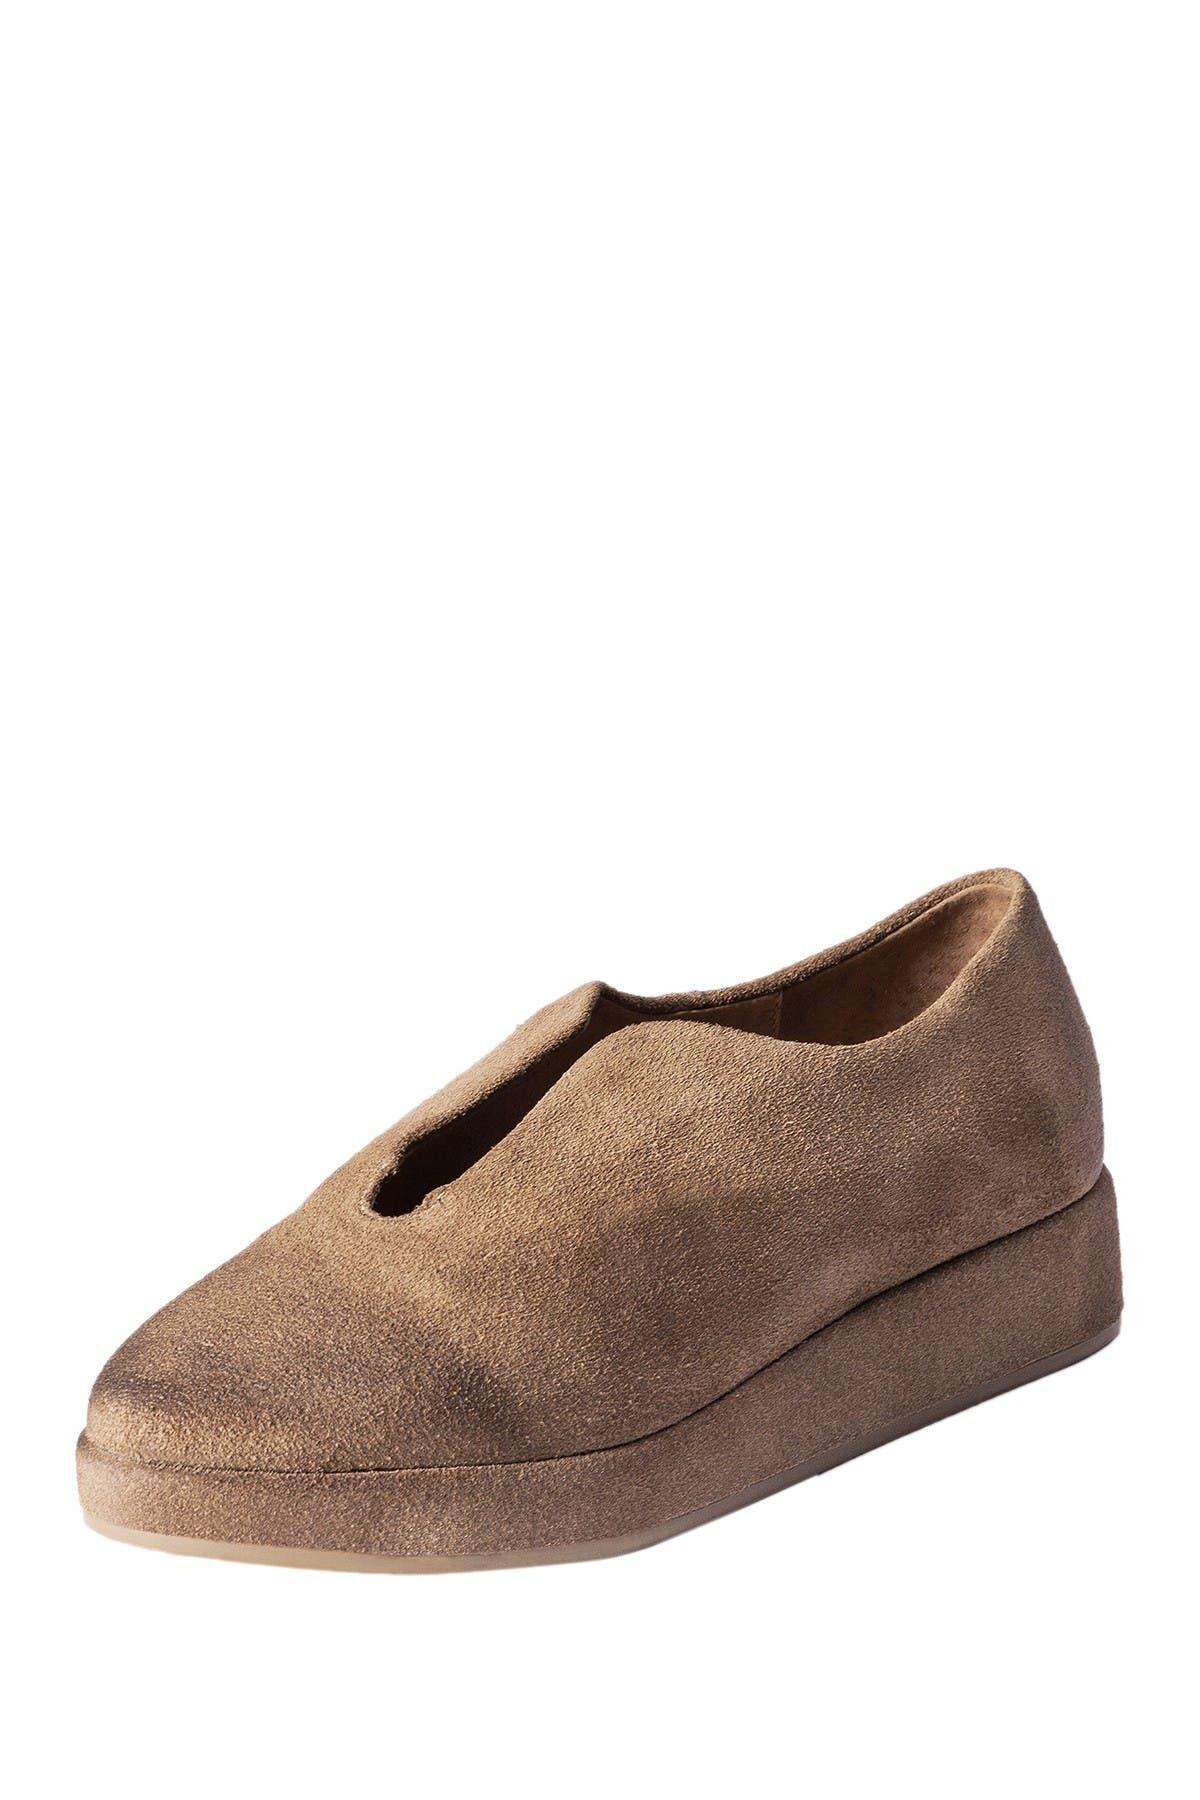 Image of Antelope Suede Flatform Sneaker